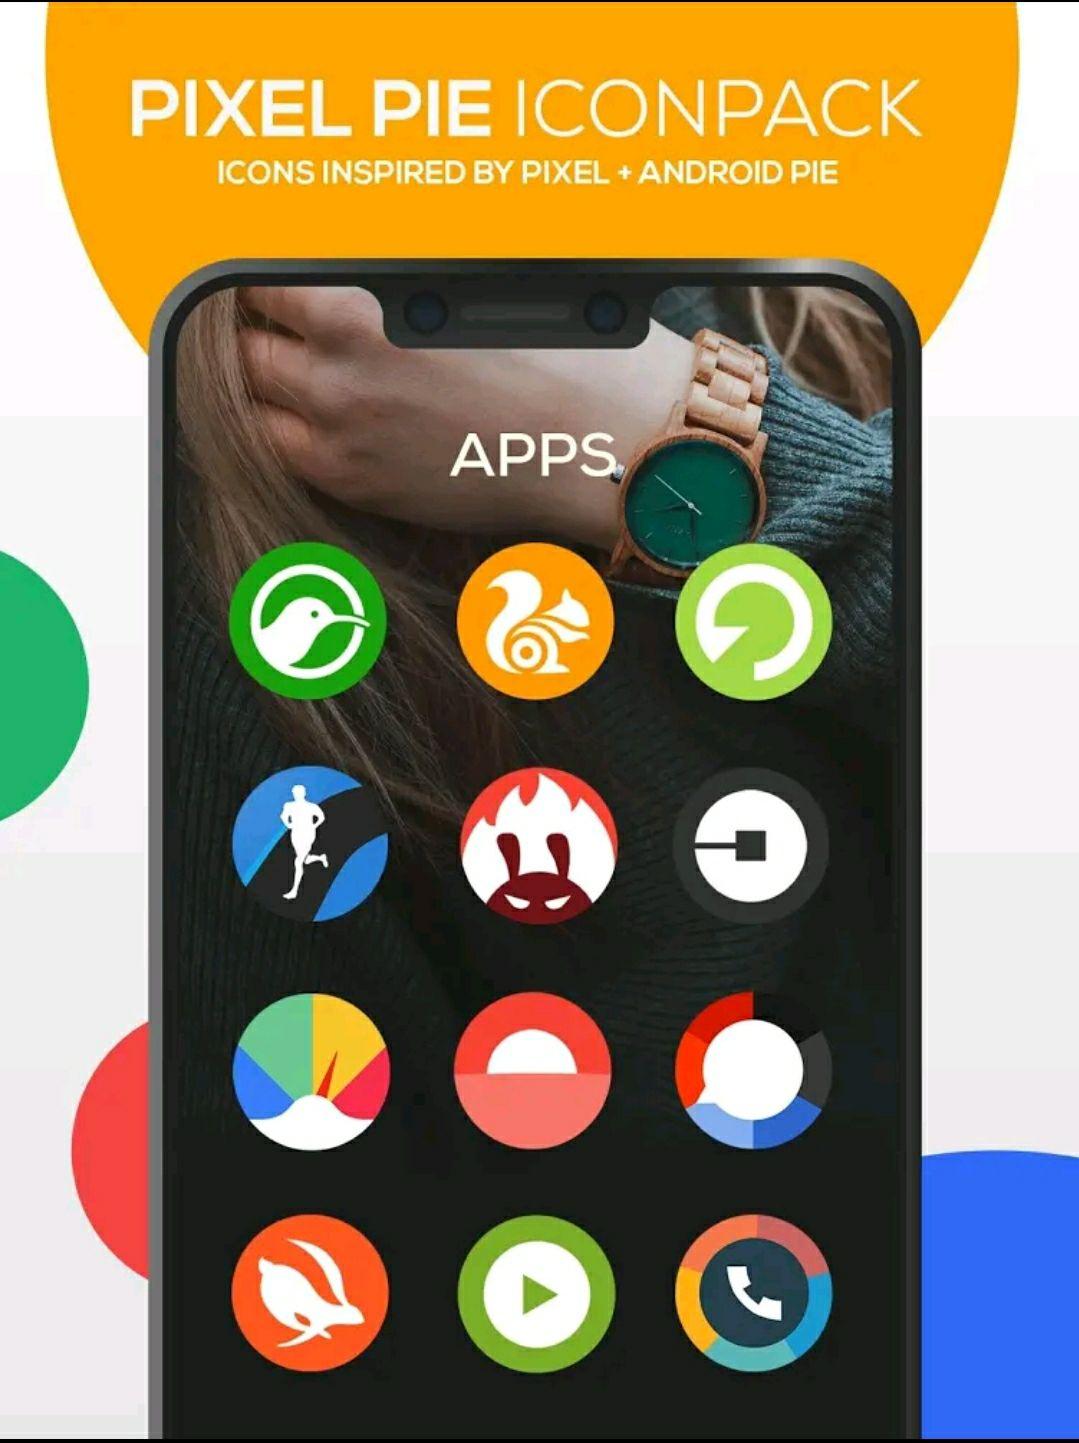 Zestaw ikon - Pixel Pie Icon Pack ; Pixel Pie Dark Icon Pack ; BOLT Icon Pack